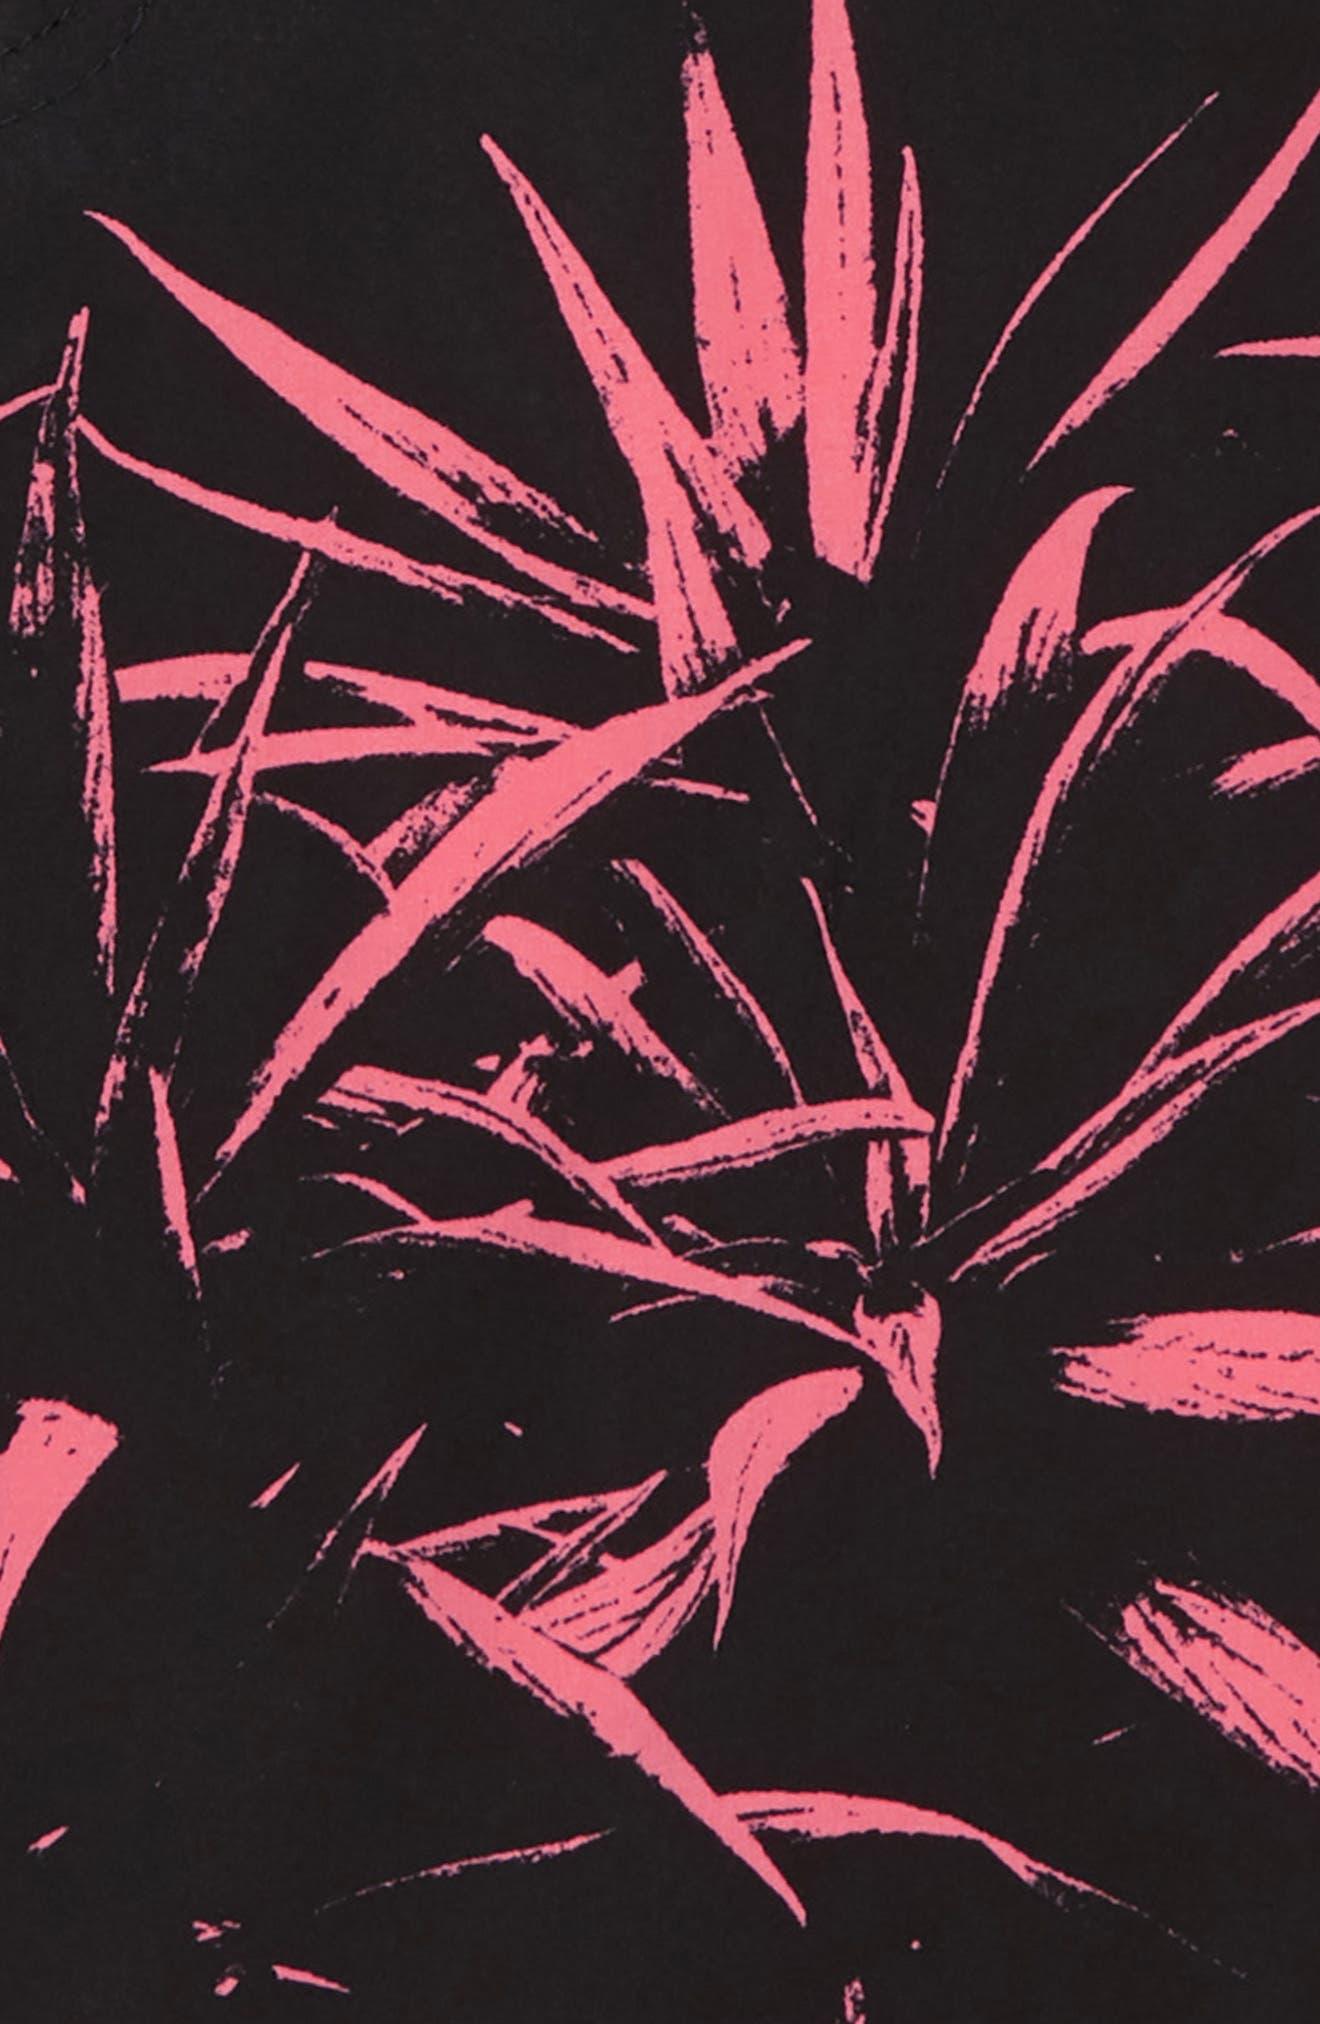 Scalloped Board Shorts,                             Alternate thumbnail 2, color,                             Black